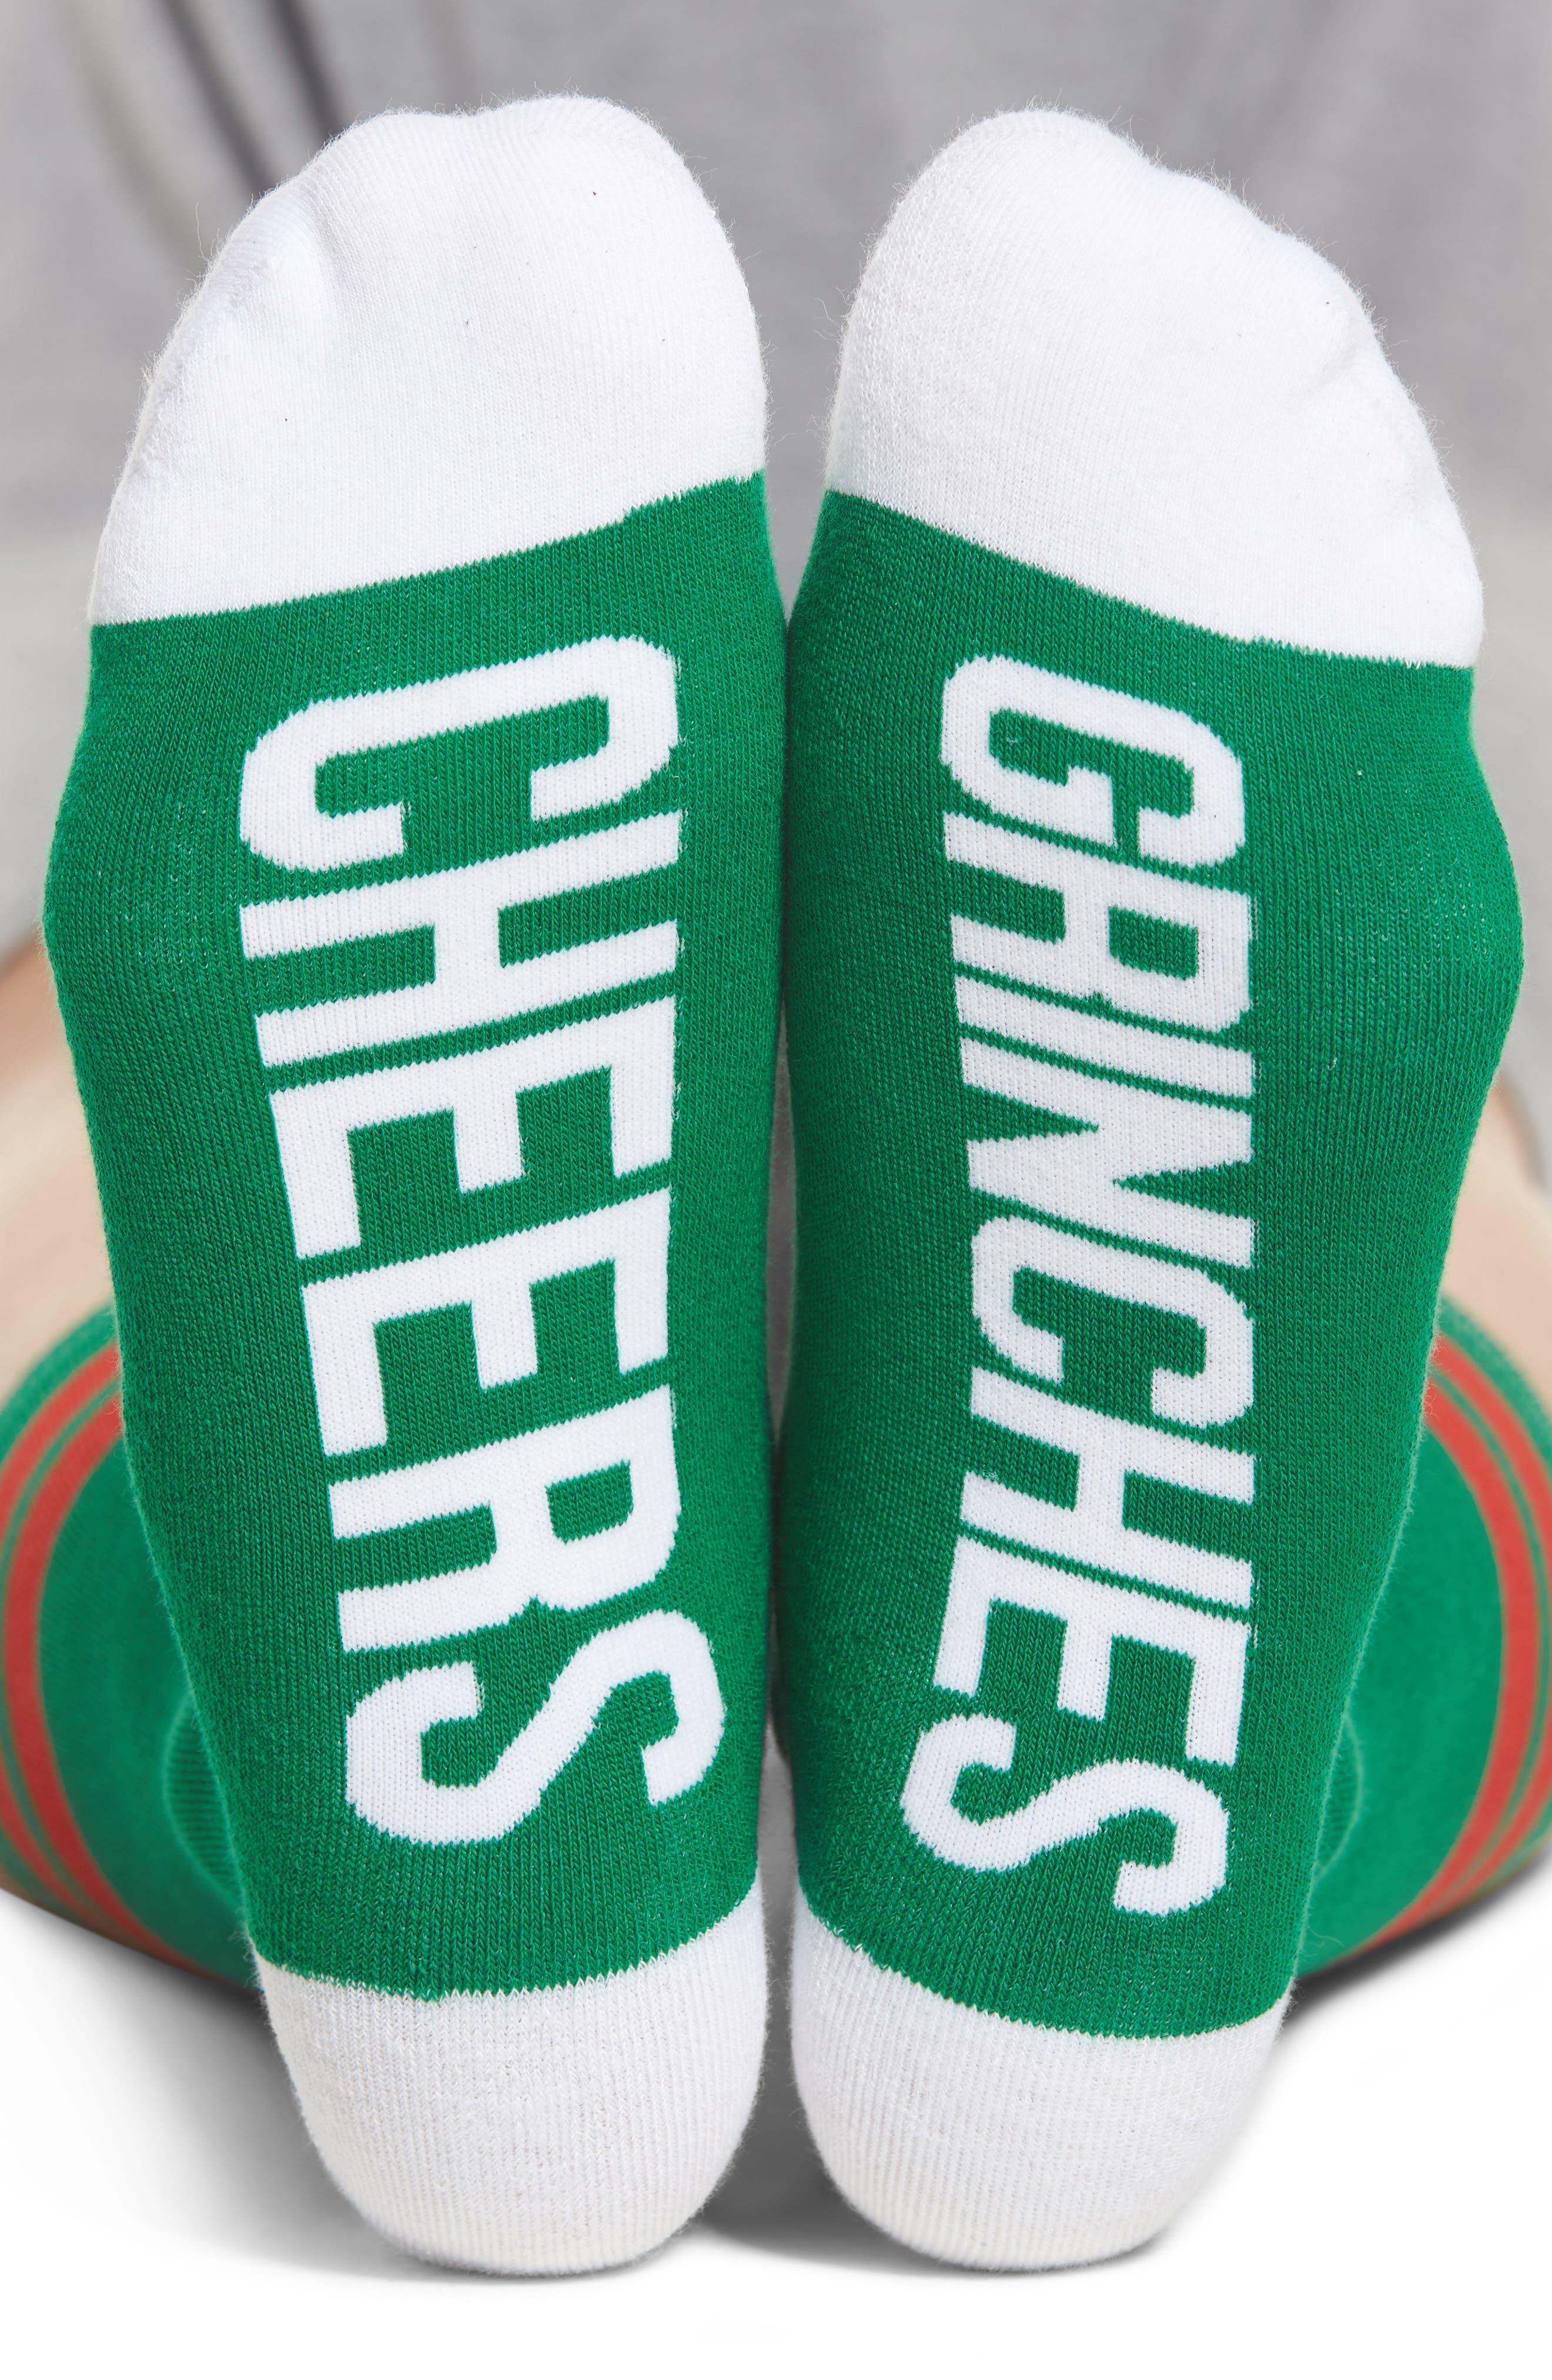 SOCKART Cheers Grinches Crew Socks